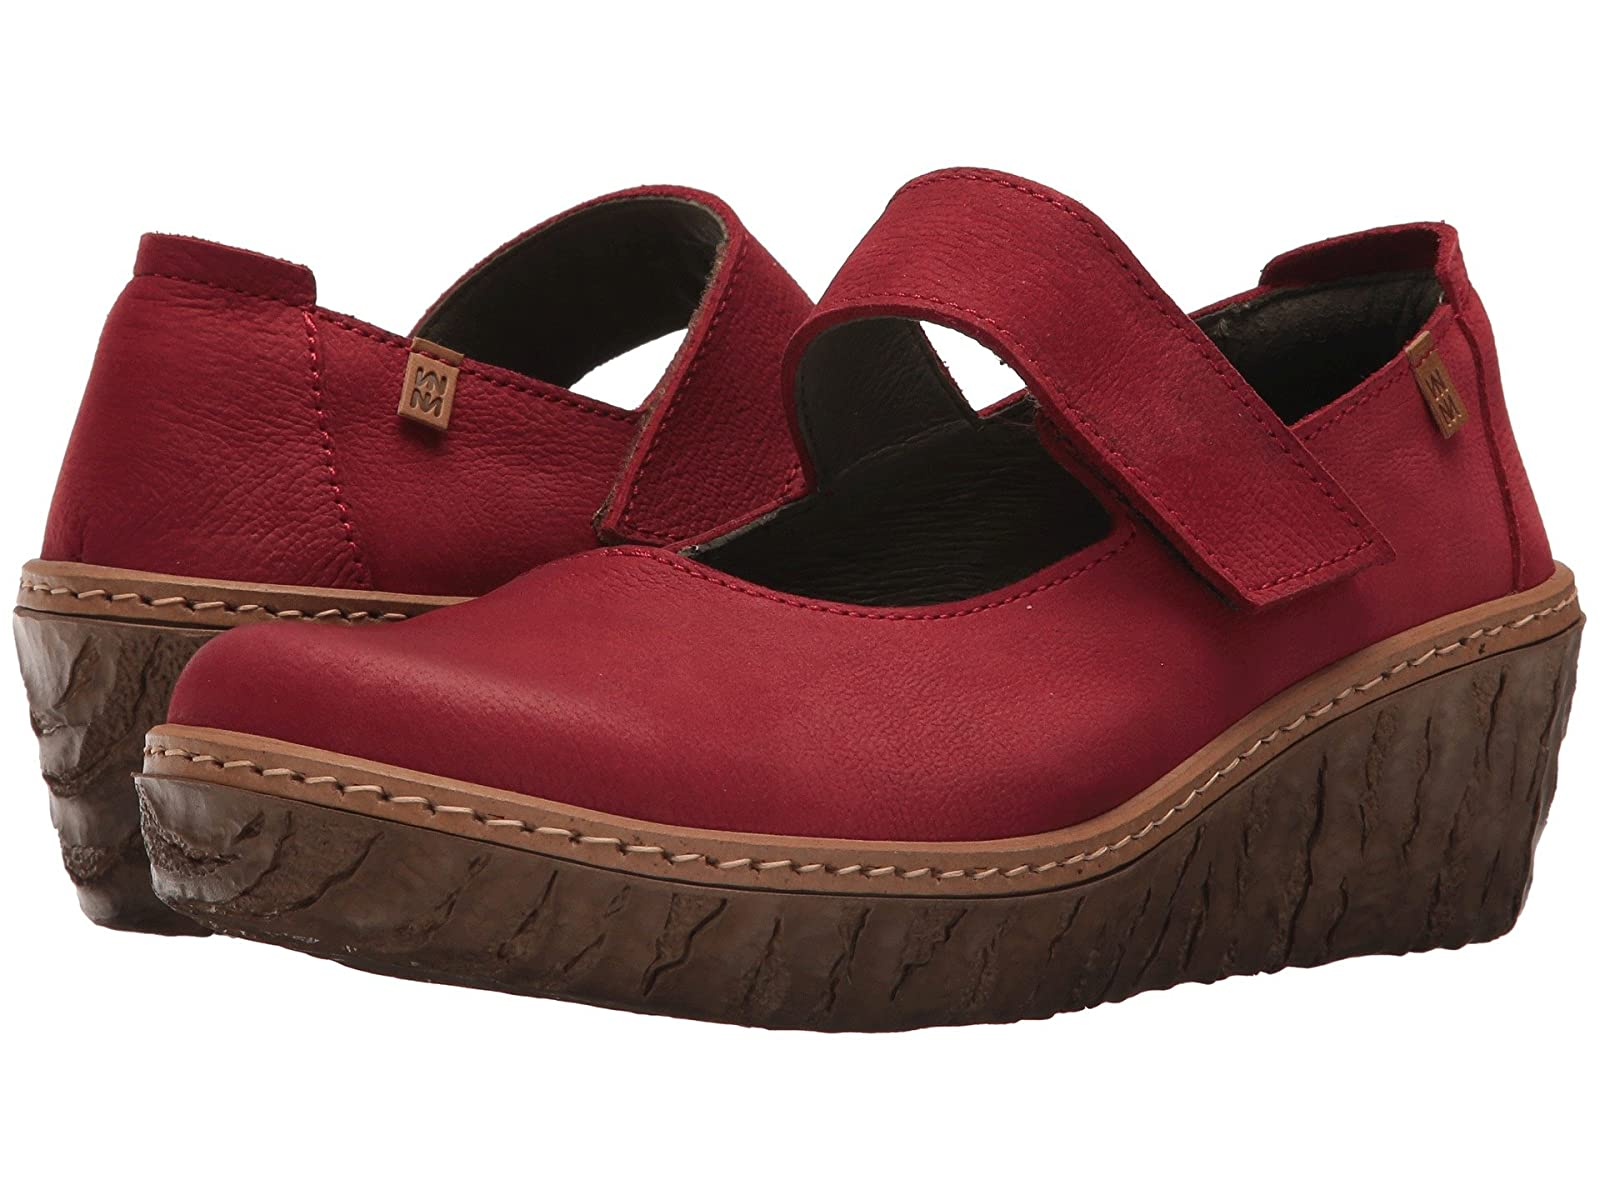 El Naturalista Myth Yggdrasil N5135Atmospheric grades have affordable shoes